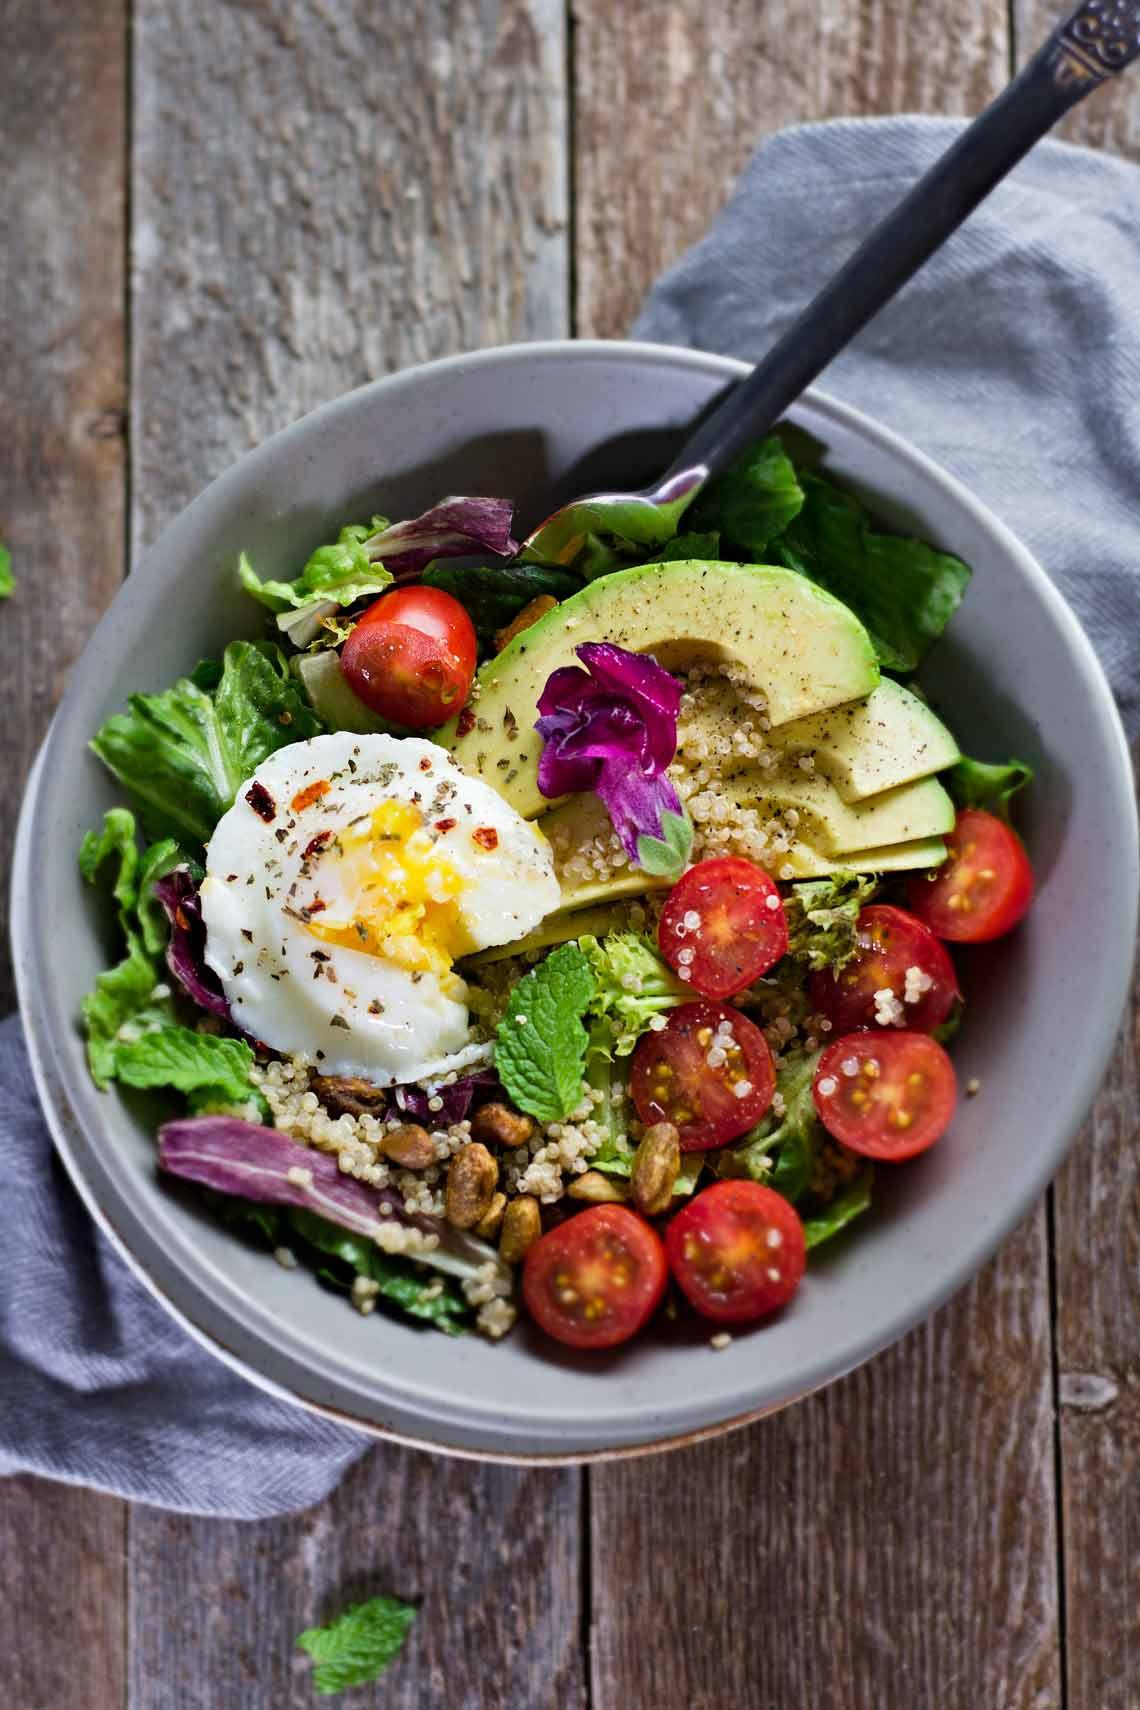 Healthy Avocado Breakfast  Poached Egg & Avocado Breakfast Salad Jar Lemons